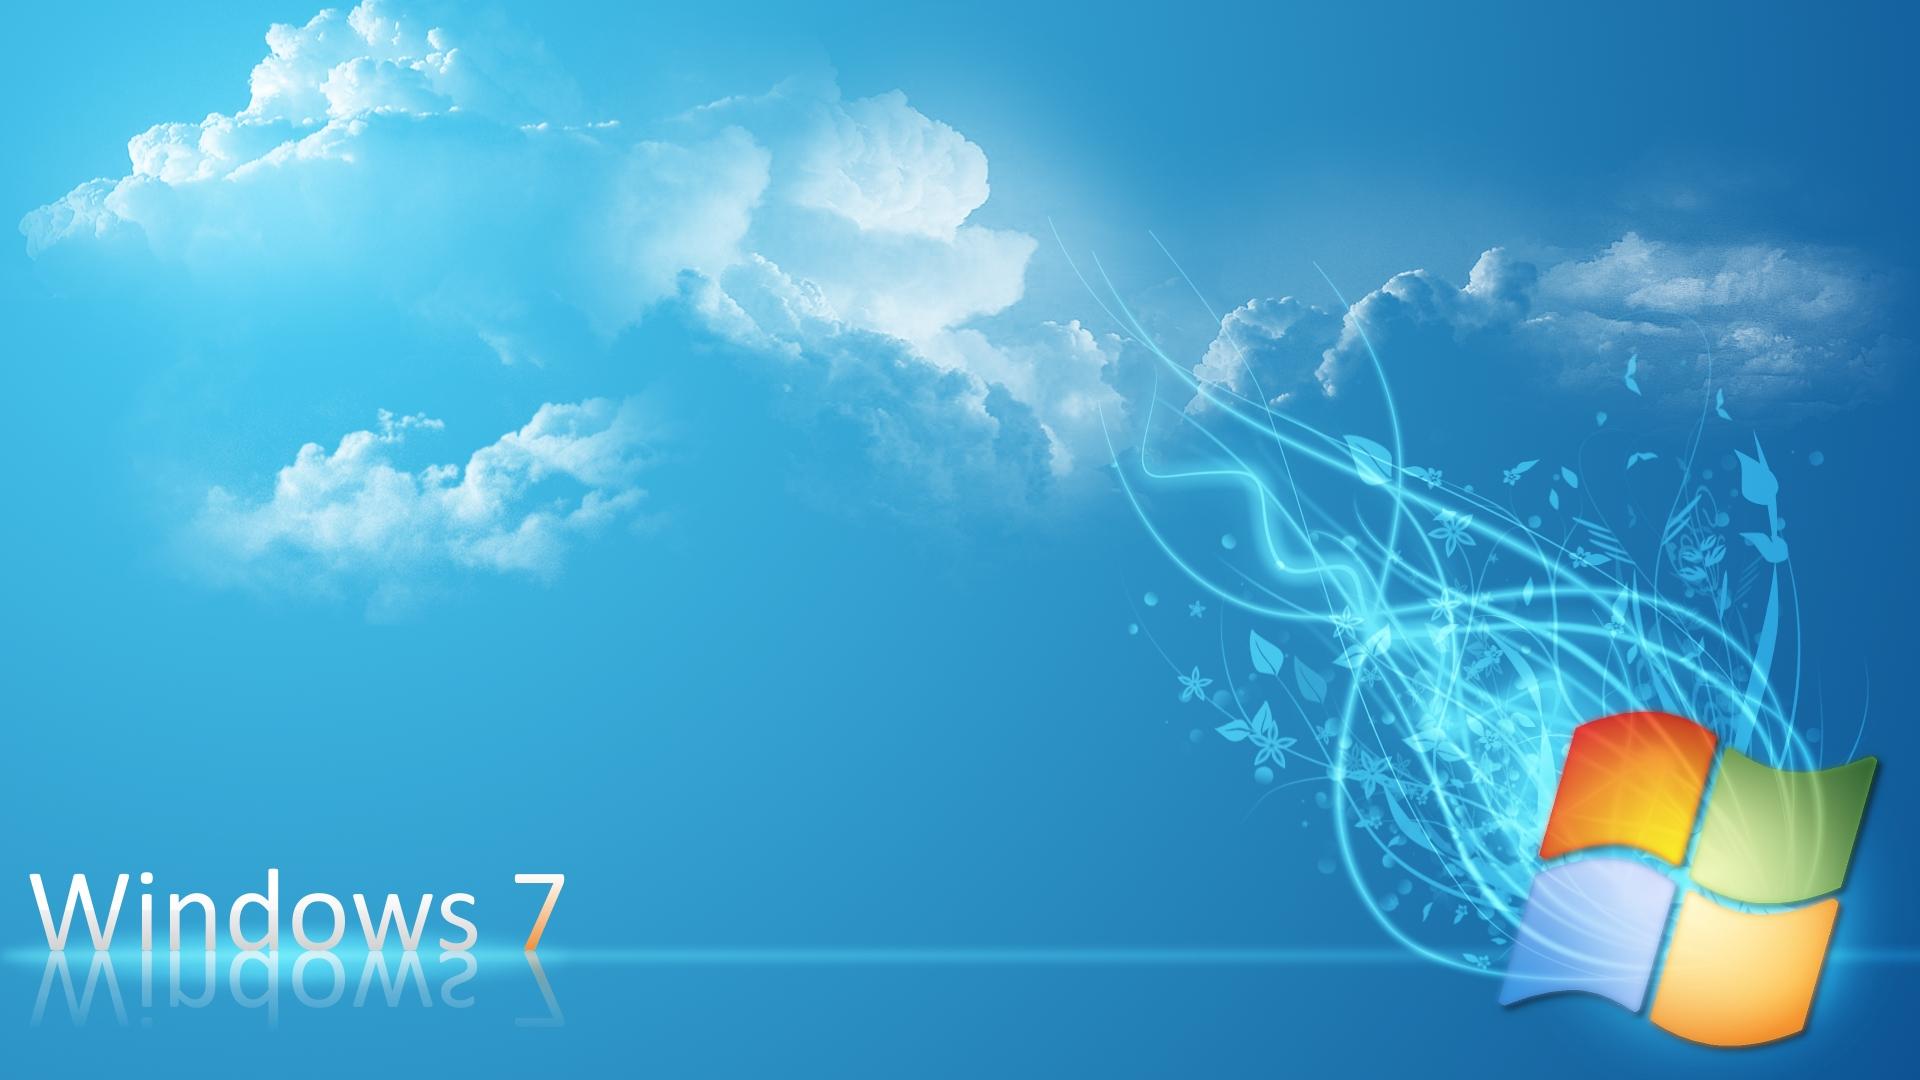 Windows 7 Wallpaper Hd wallpaper   841879 1920x1080